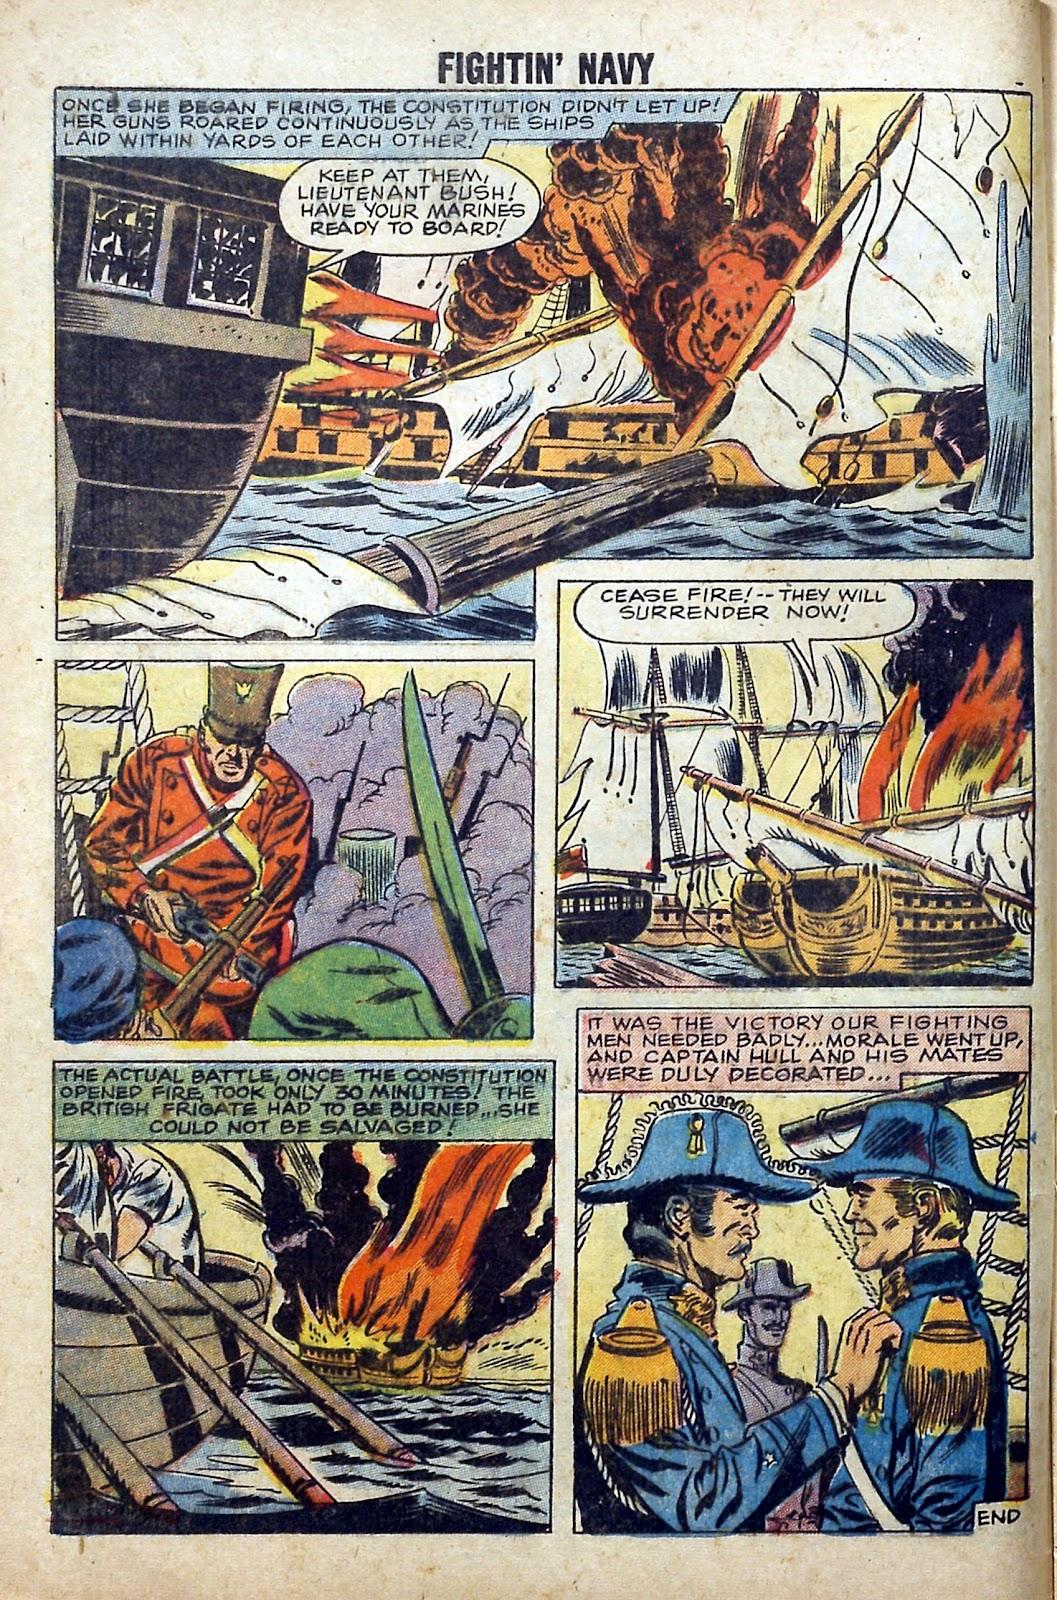 Read online Fightin' Navy comic -  Issue #84 - 8